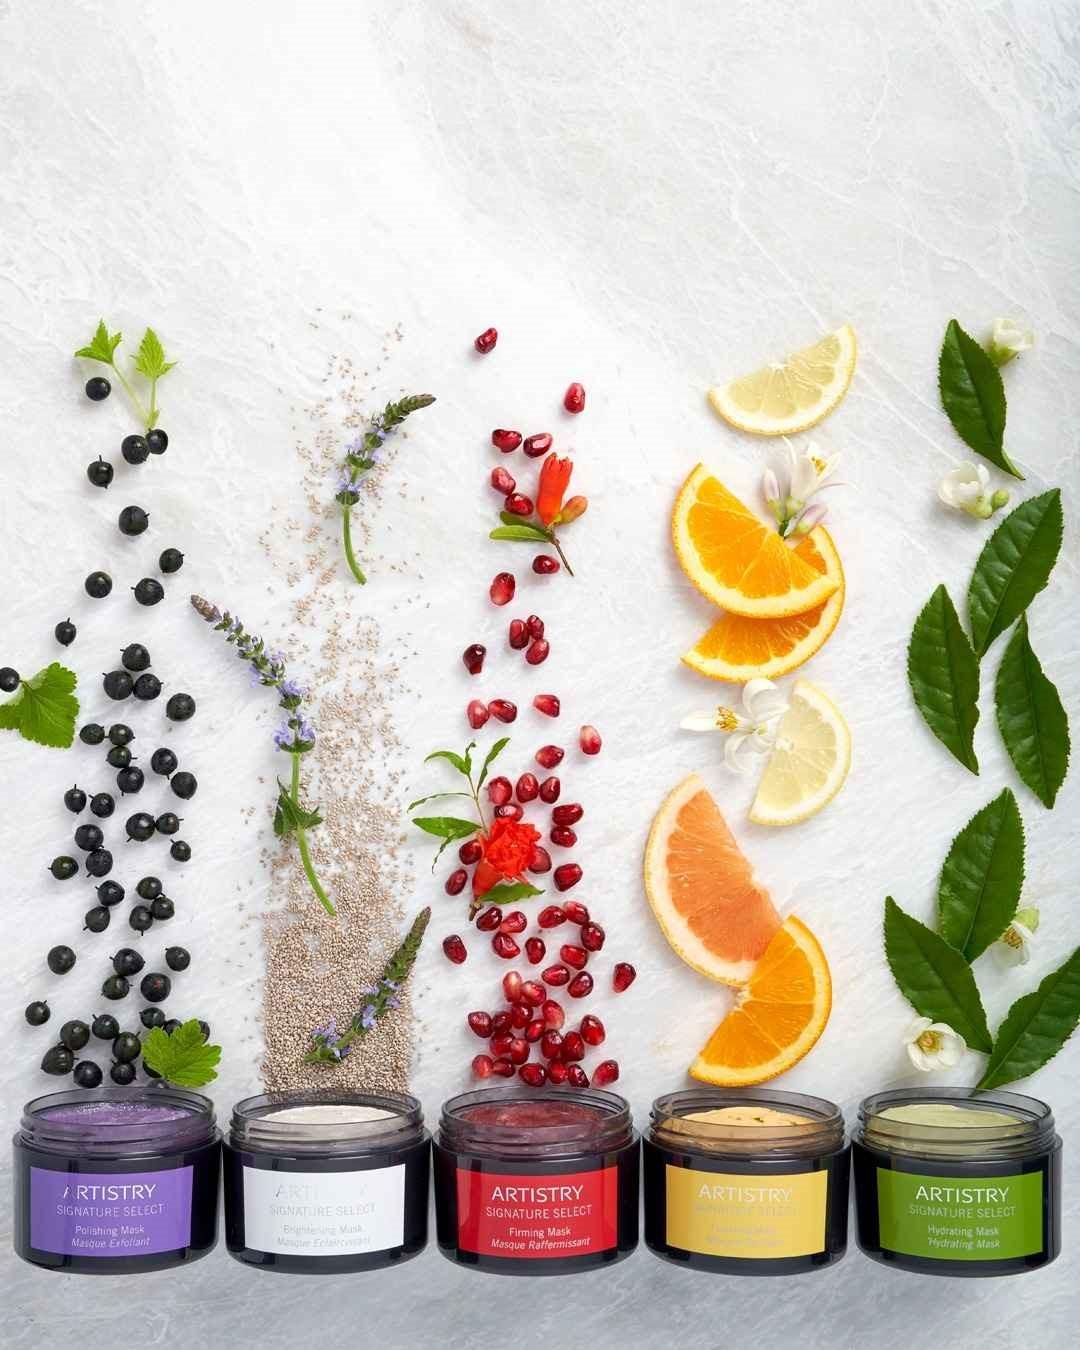 hương liệu artistrya